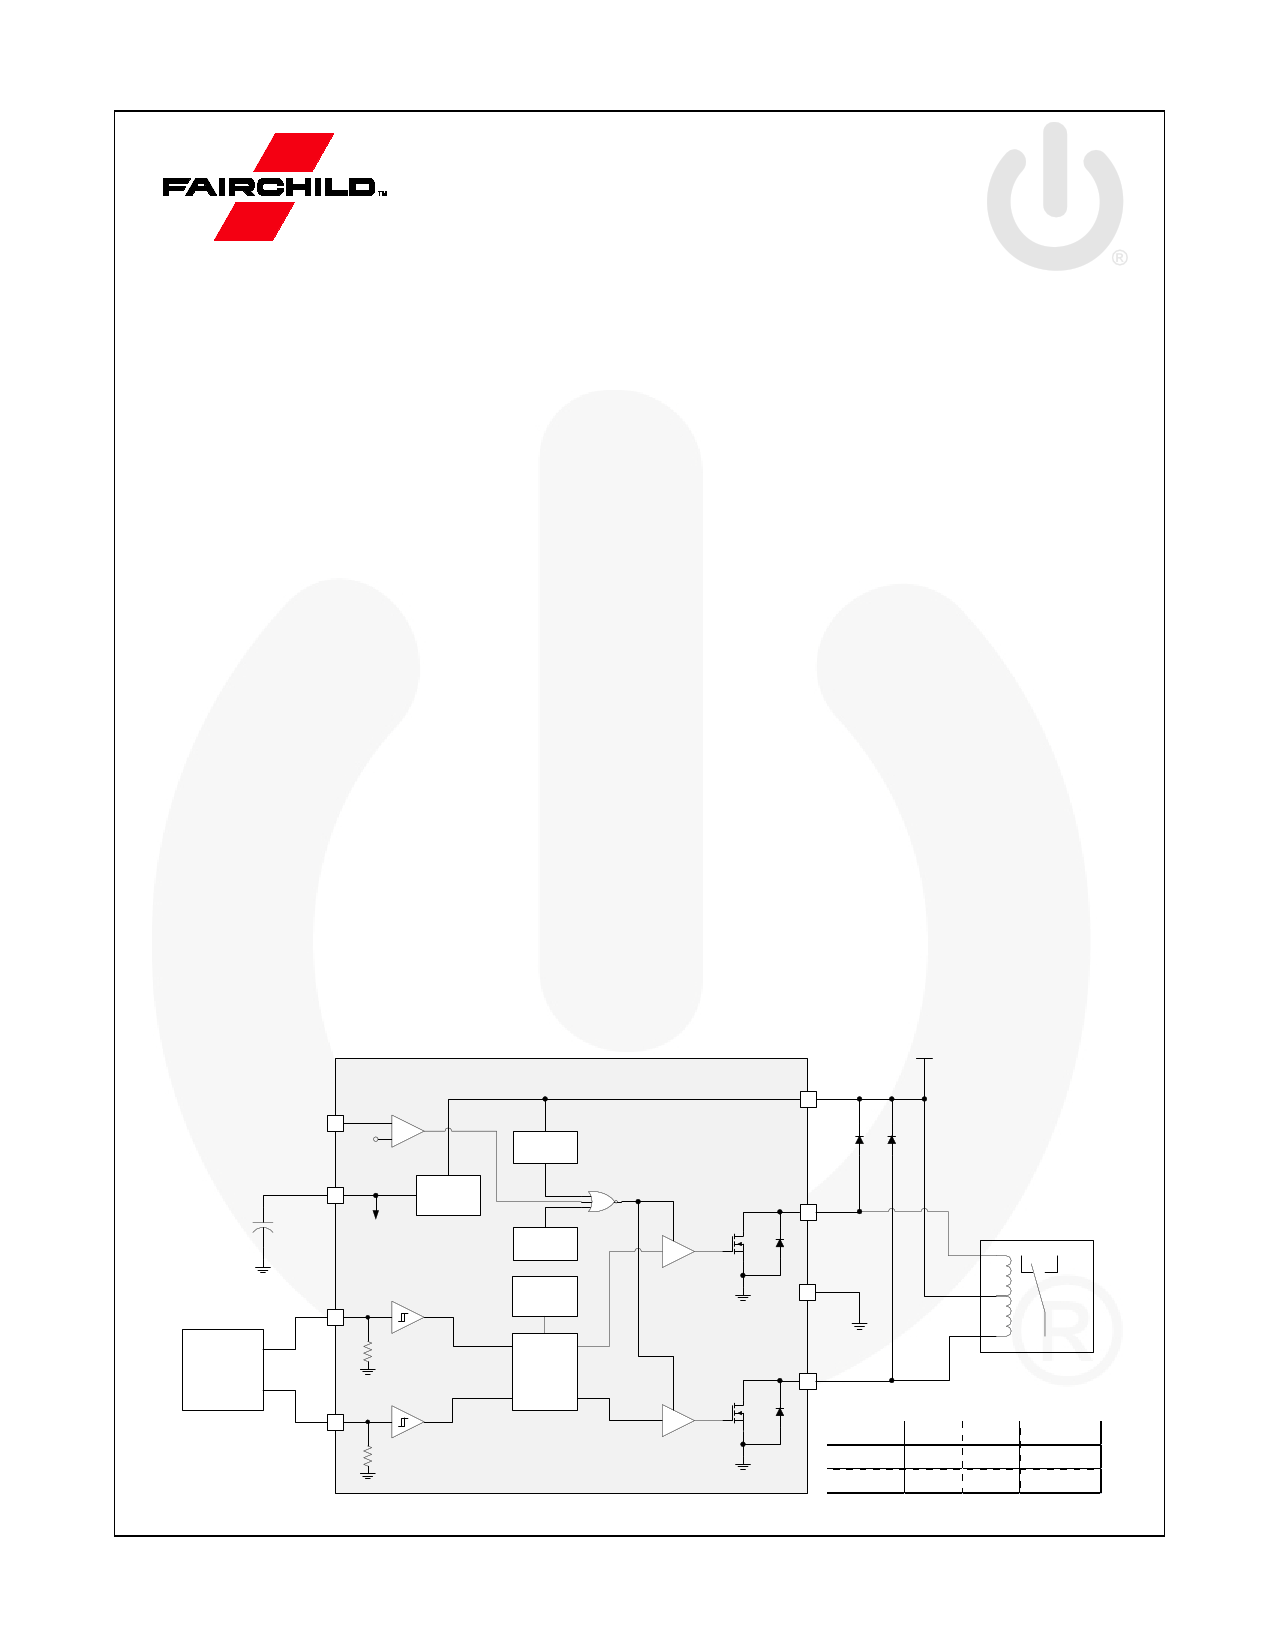 fan3240 datasheet pdf   pinout